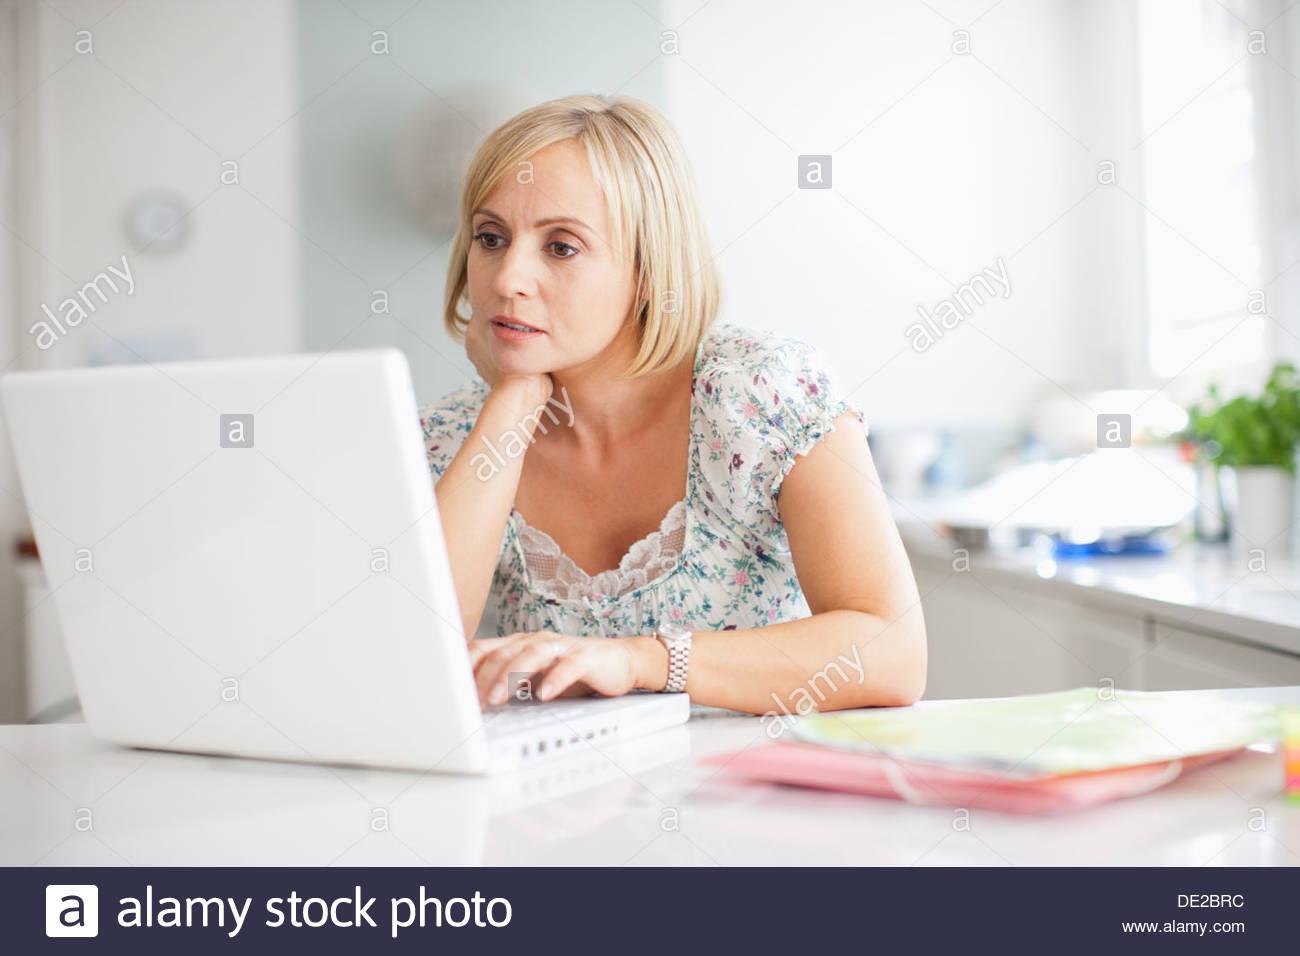 Woman using laptop - Stock Image